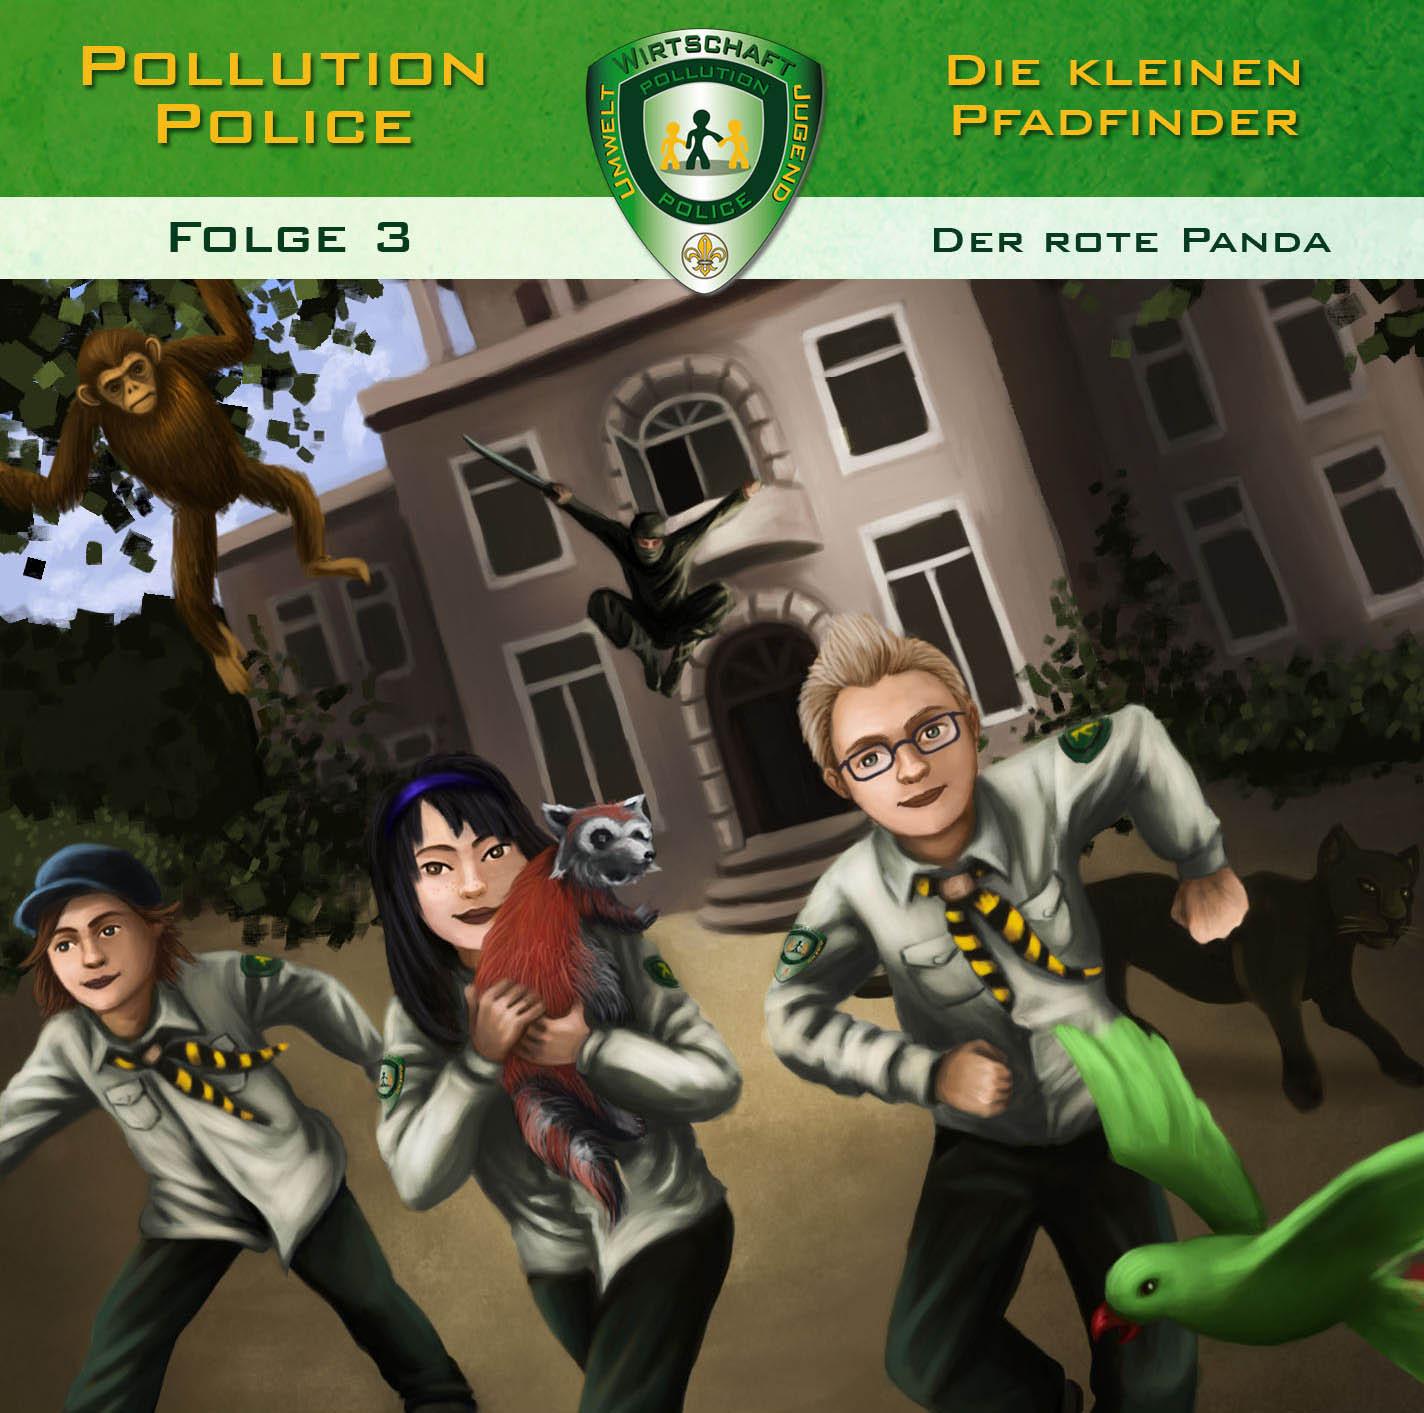 Pollution Police - 03 - Der rote Panda